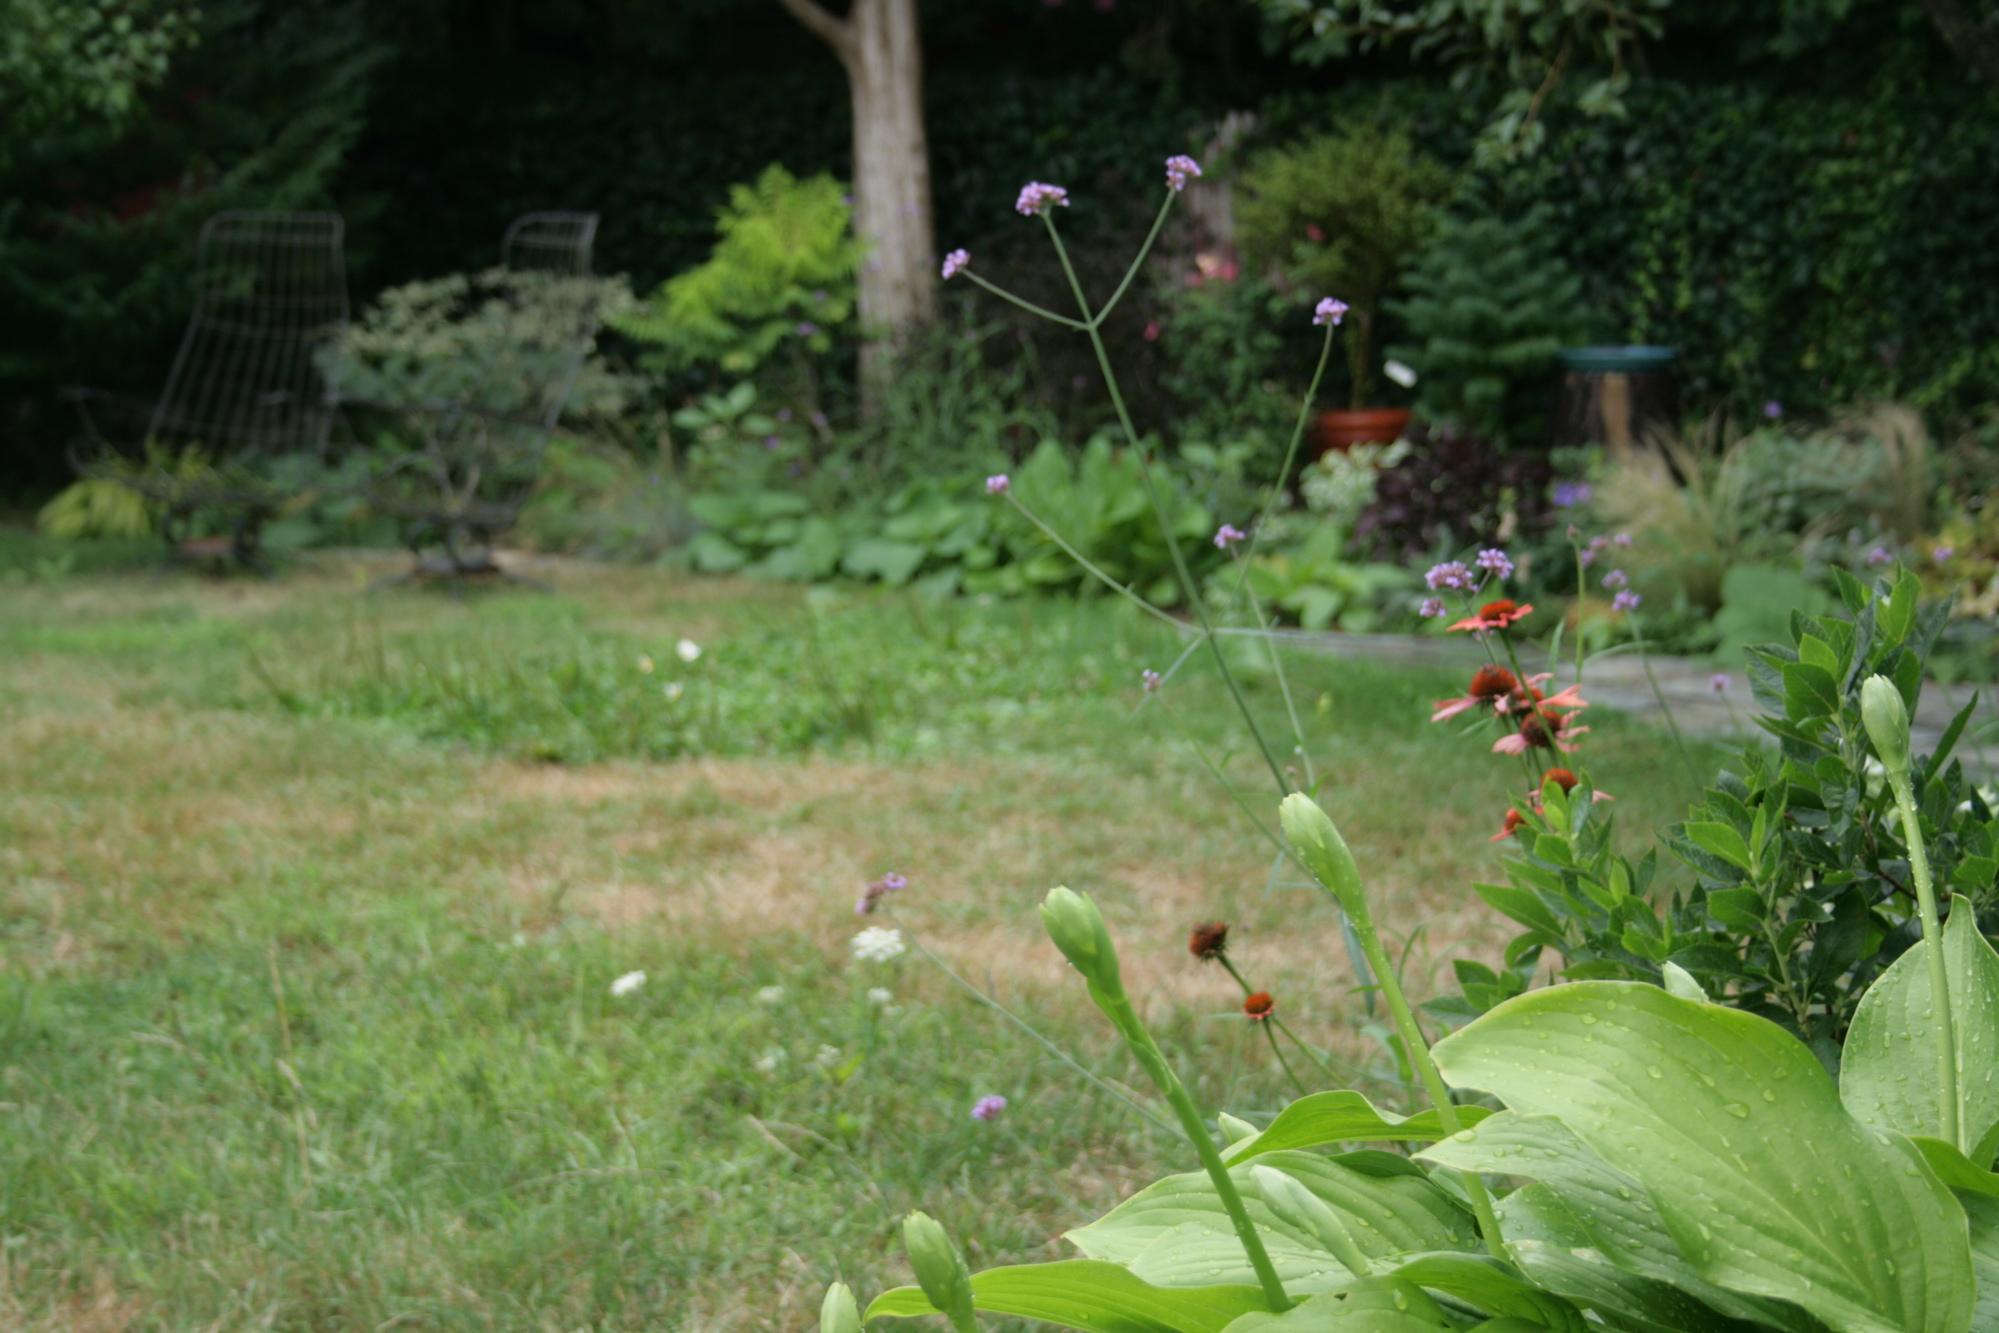 Fine Gardening Garden Photo Of The Day Kristin Green Trench Manicure